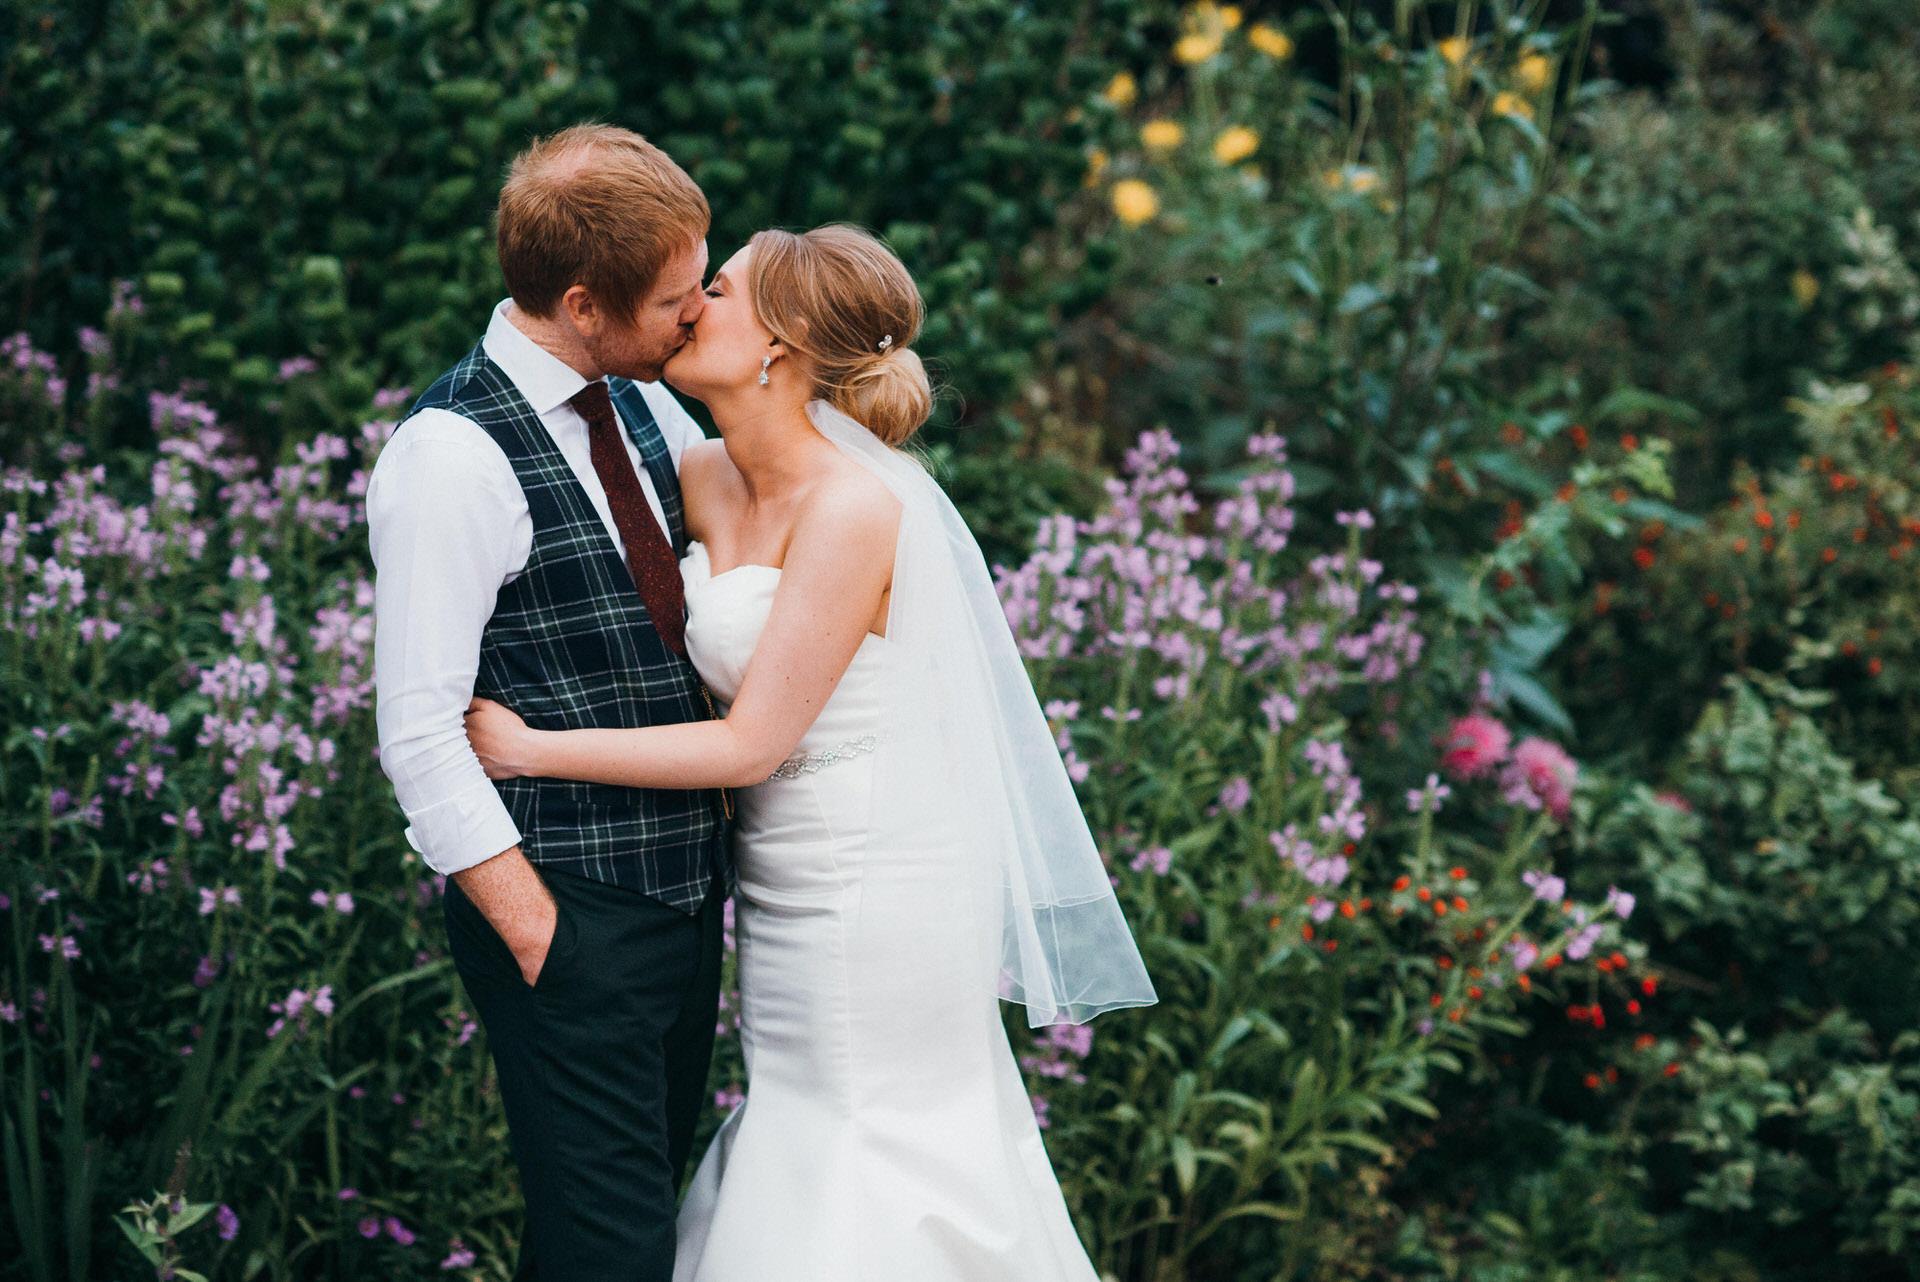 Maunsel house wedding photography 57 wedding portrait